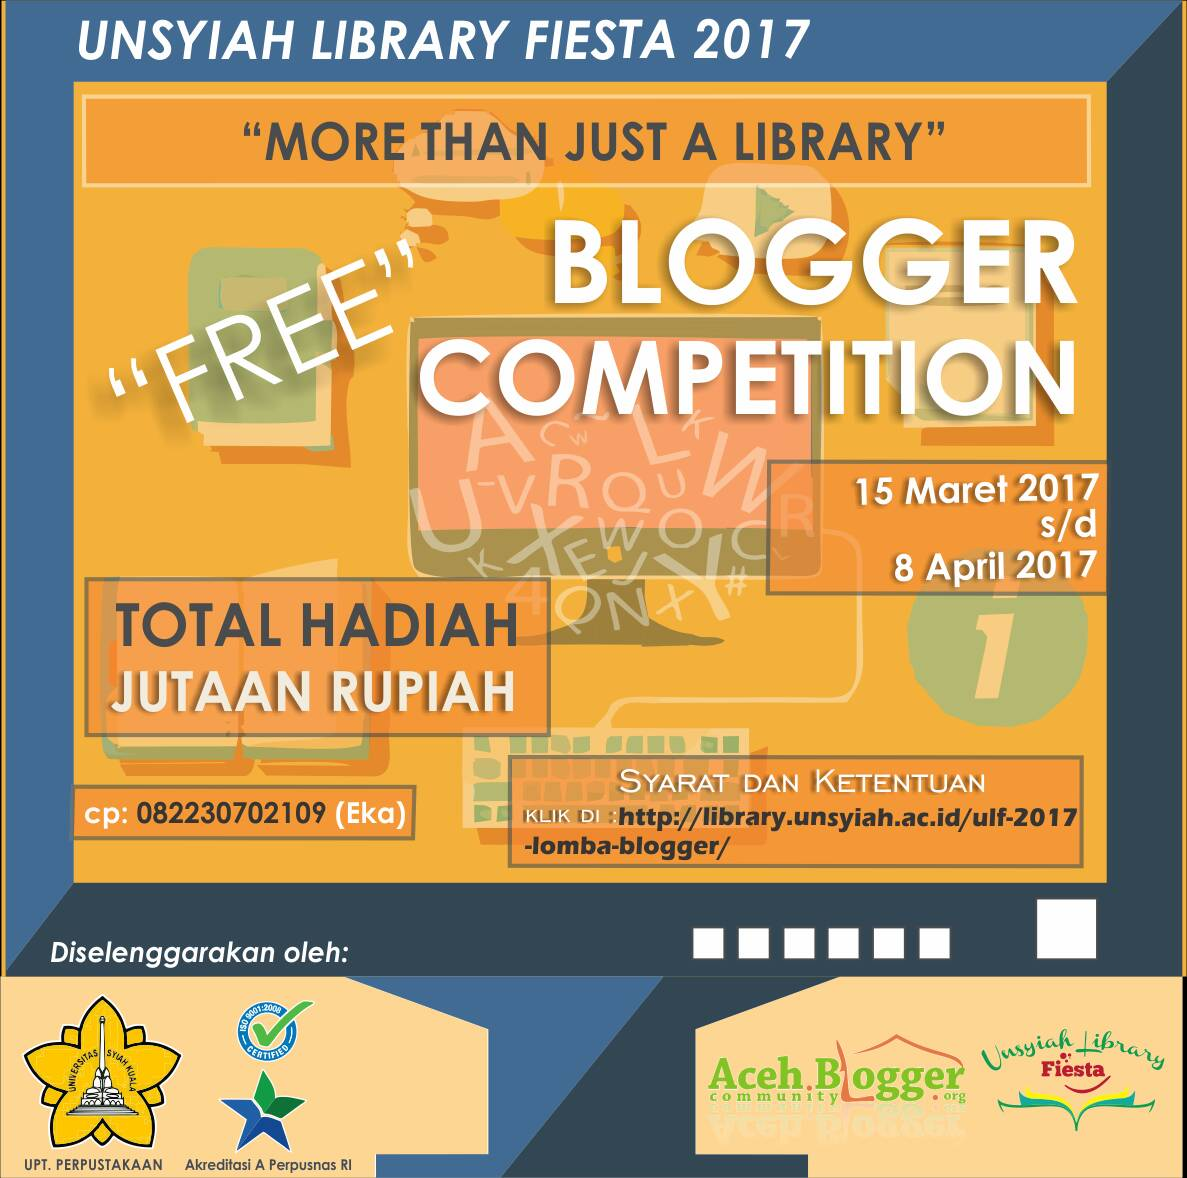 UNSYIAH LIBRARY FIESTA 2017